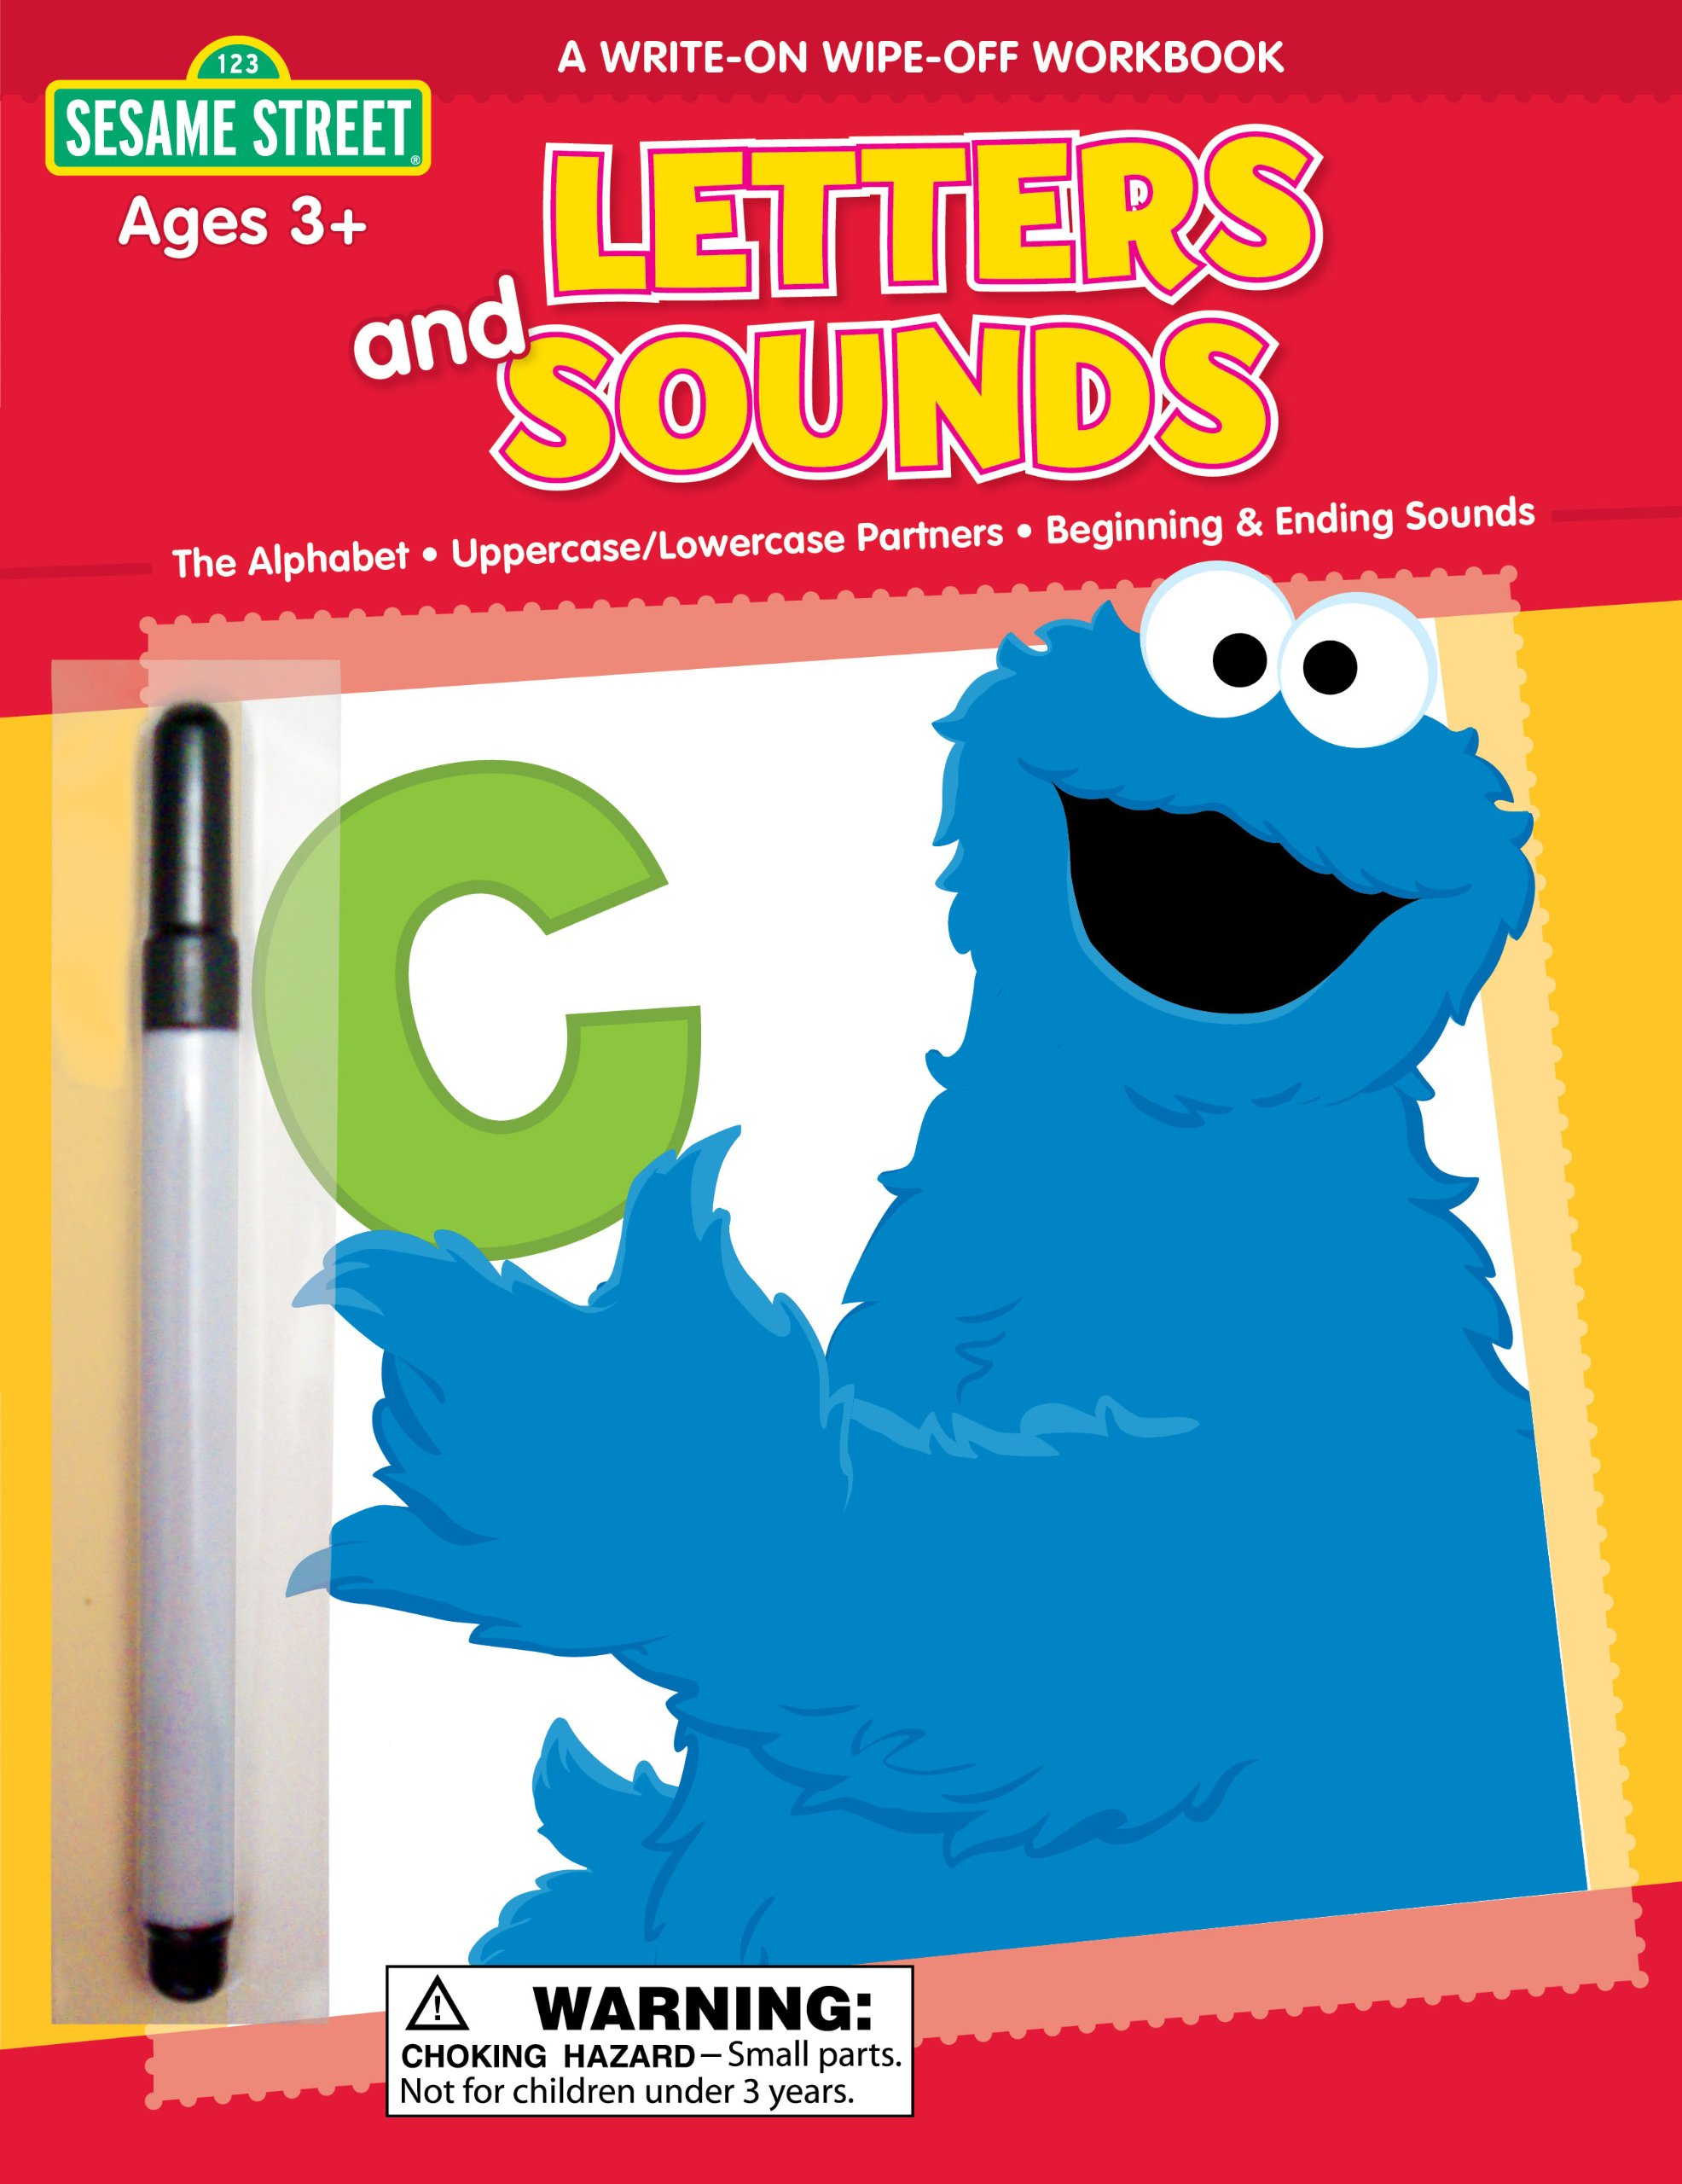 Sesame Street Letters & Sounds Write-On Wipe-Off Workbook (1 2 3 Sesame Street) pdf epub